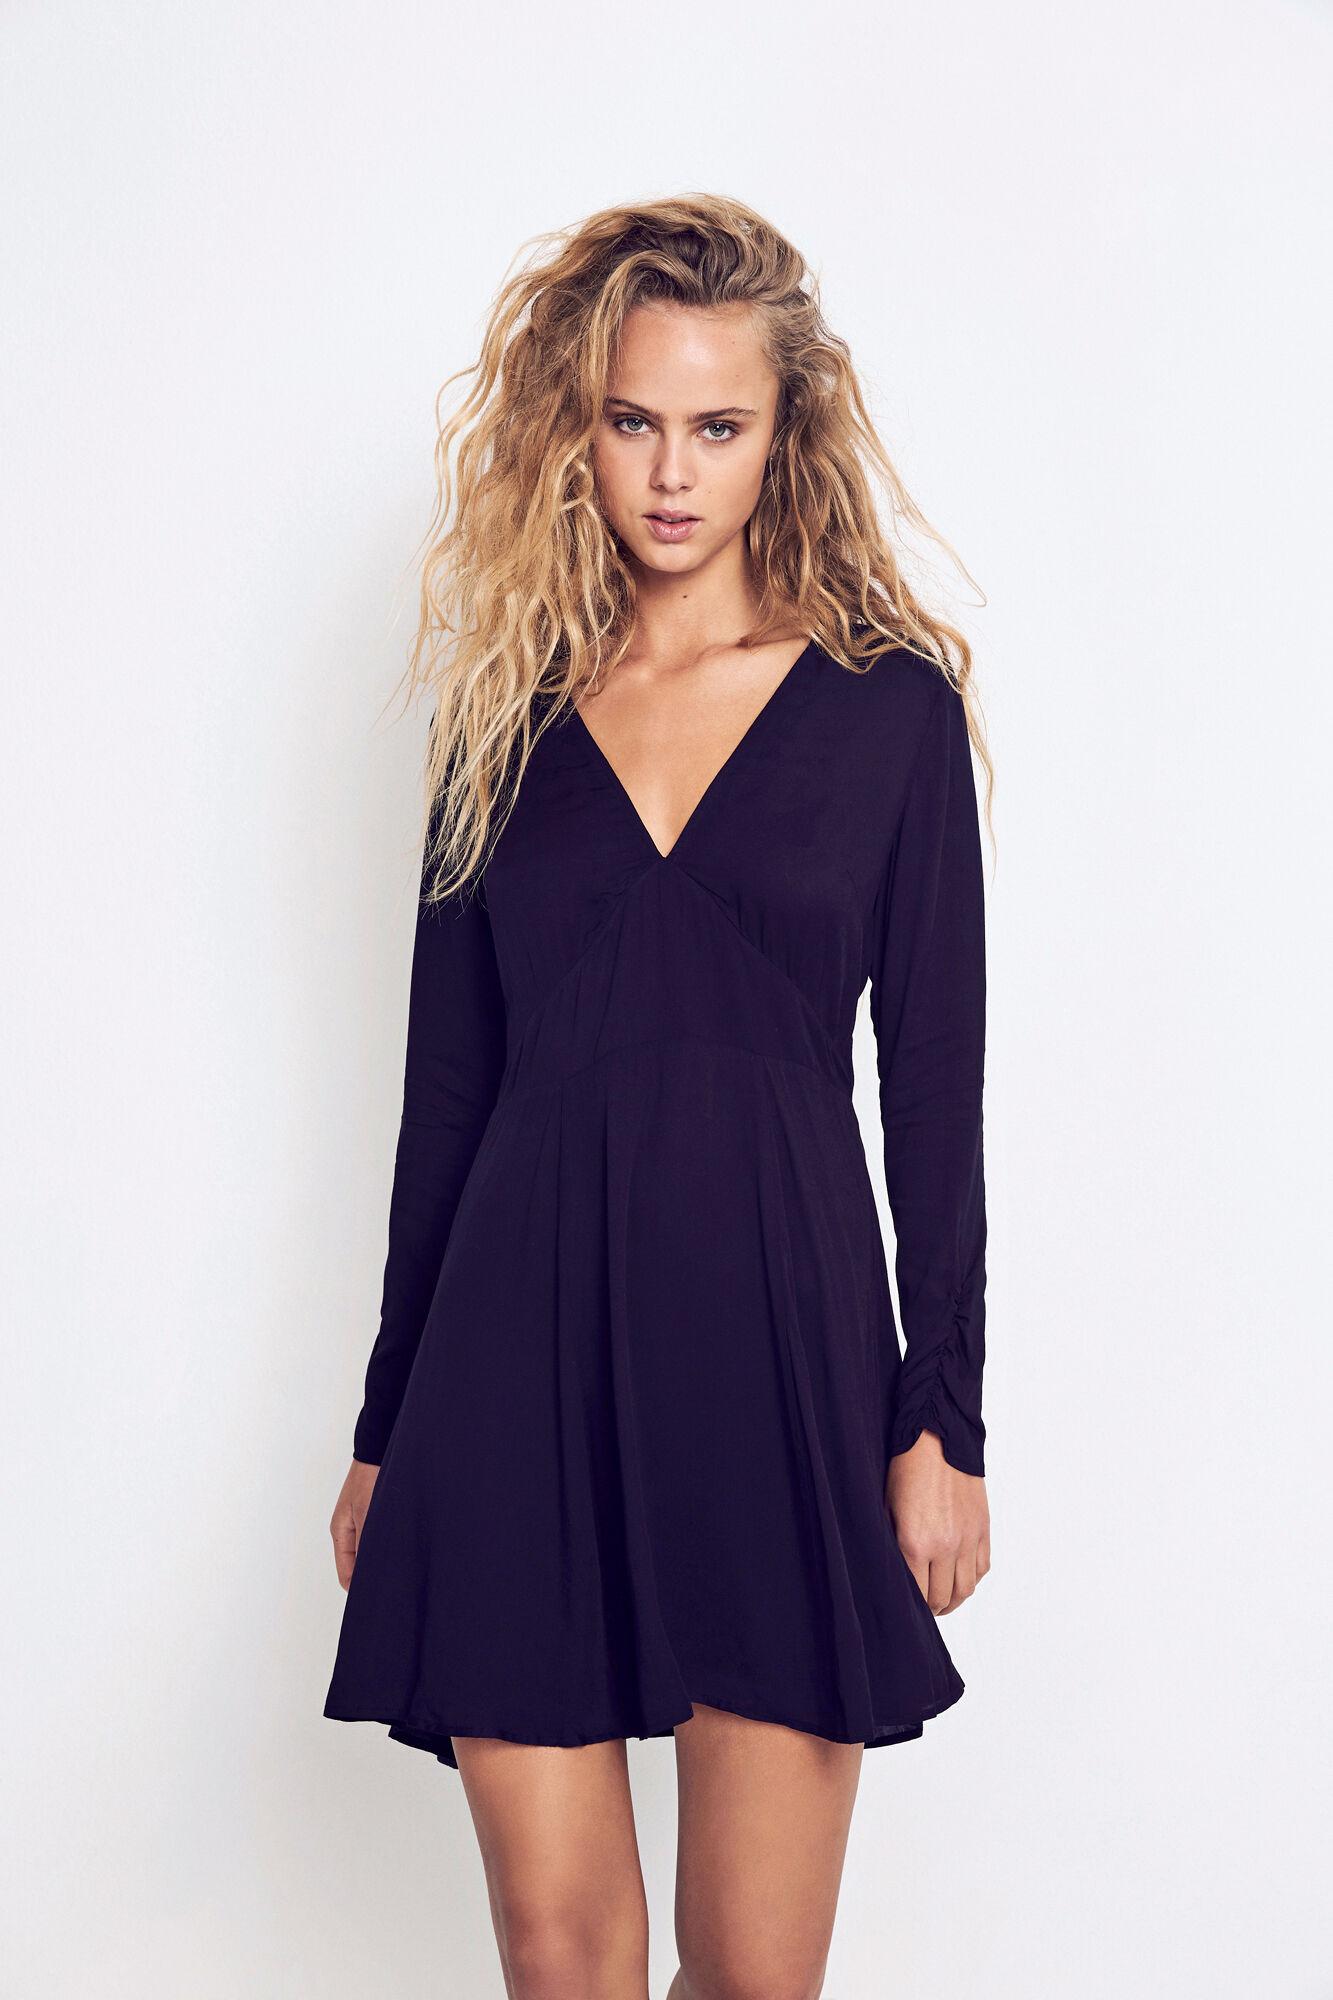 ENKYOTO LS DRESS 6614